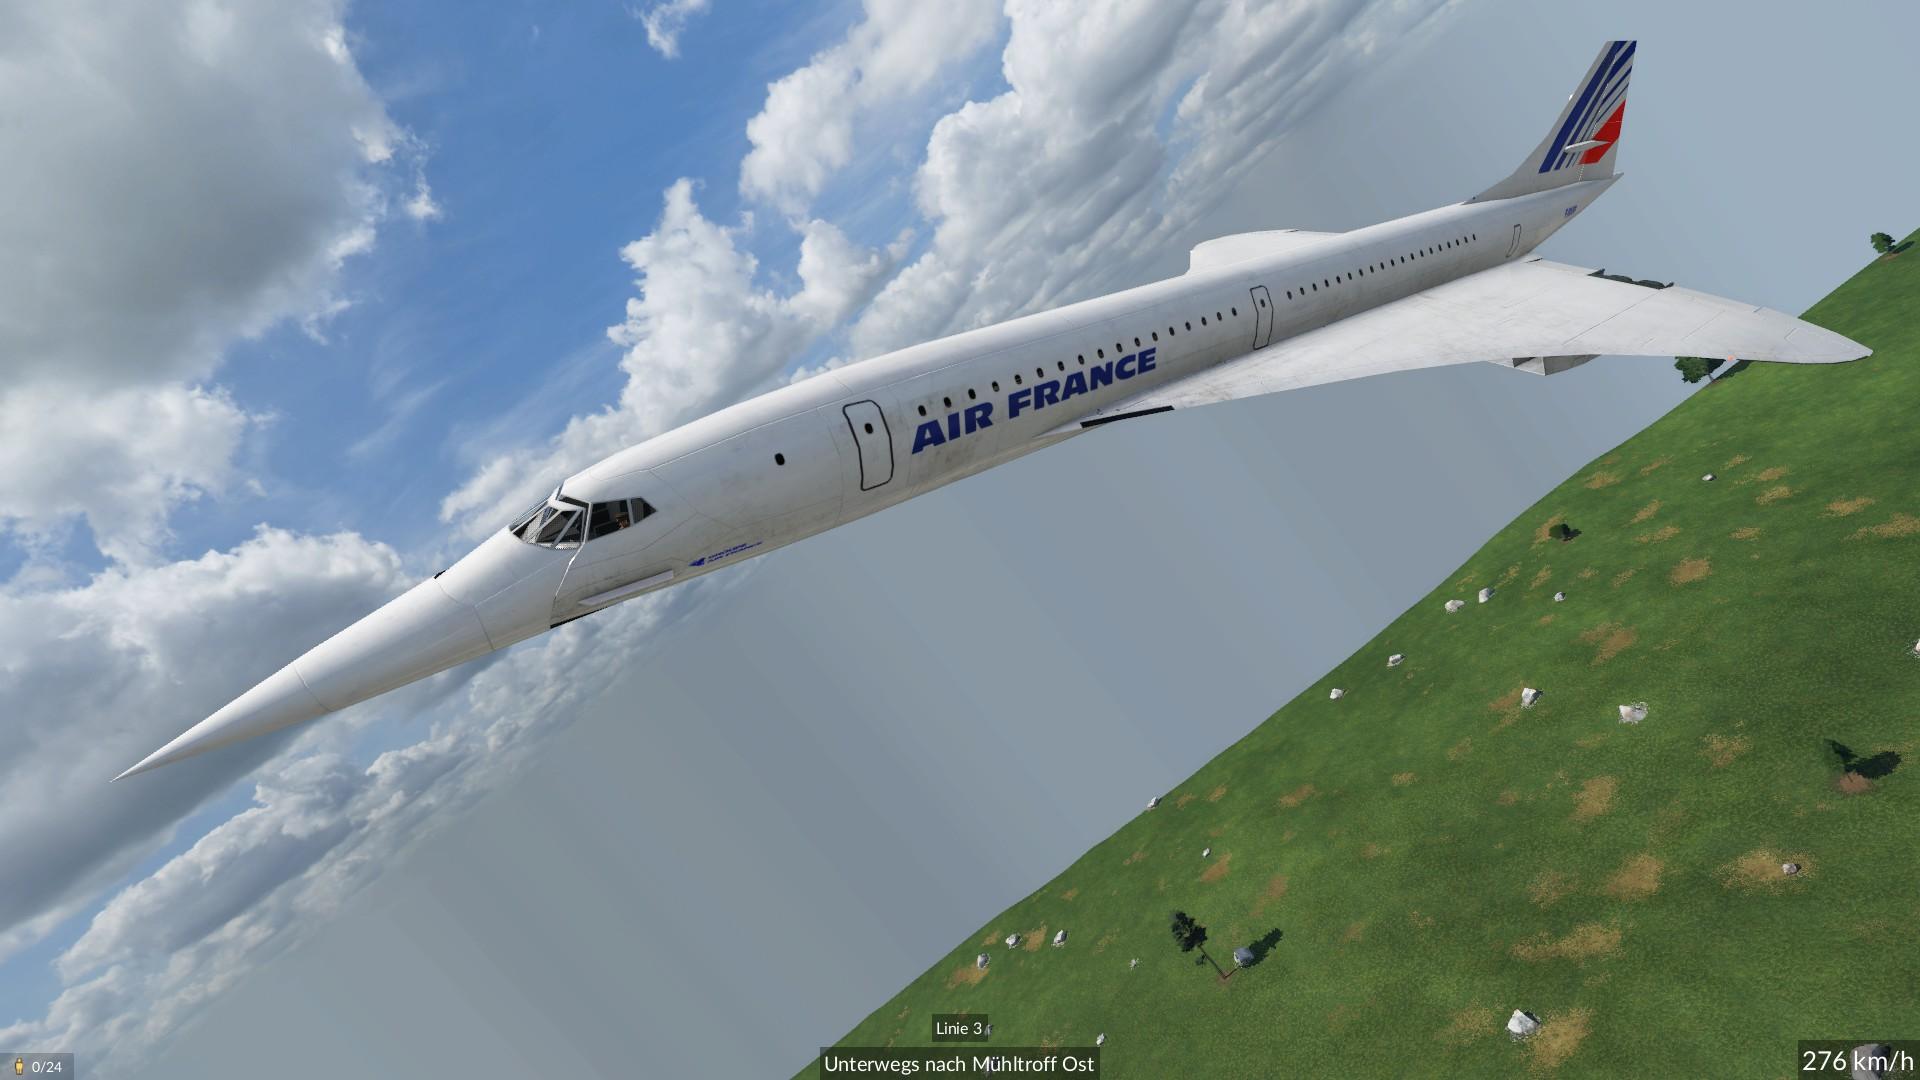 Transport Fever 2 - Concorde Plane